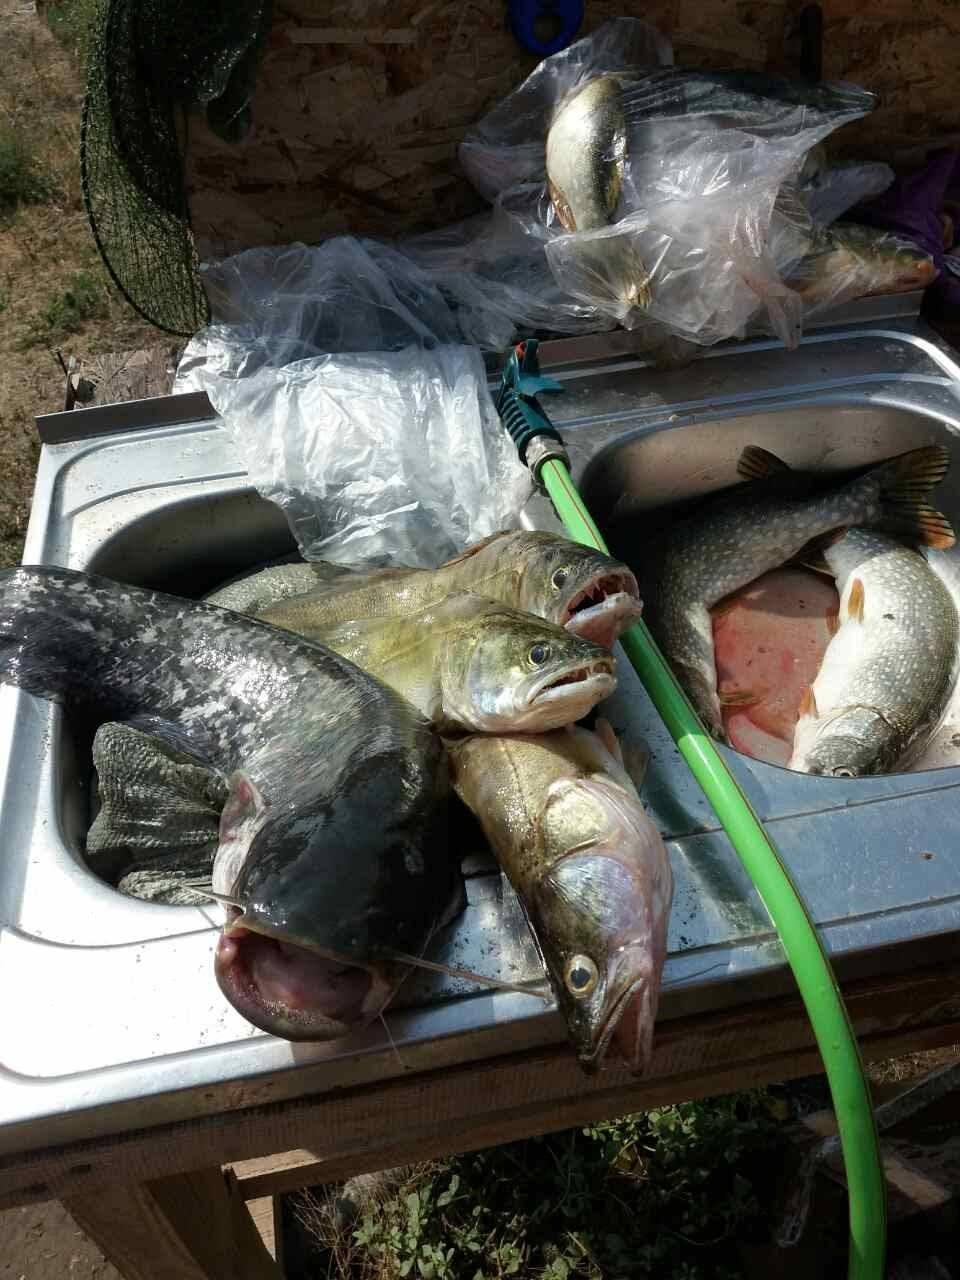 База отдыха «дом рыбака на ахтубе» ахтуба, в астраханской области - цены 2020, фото, отзывы